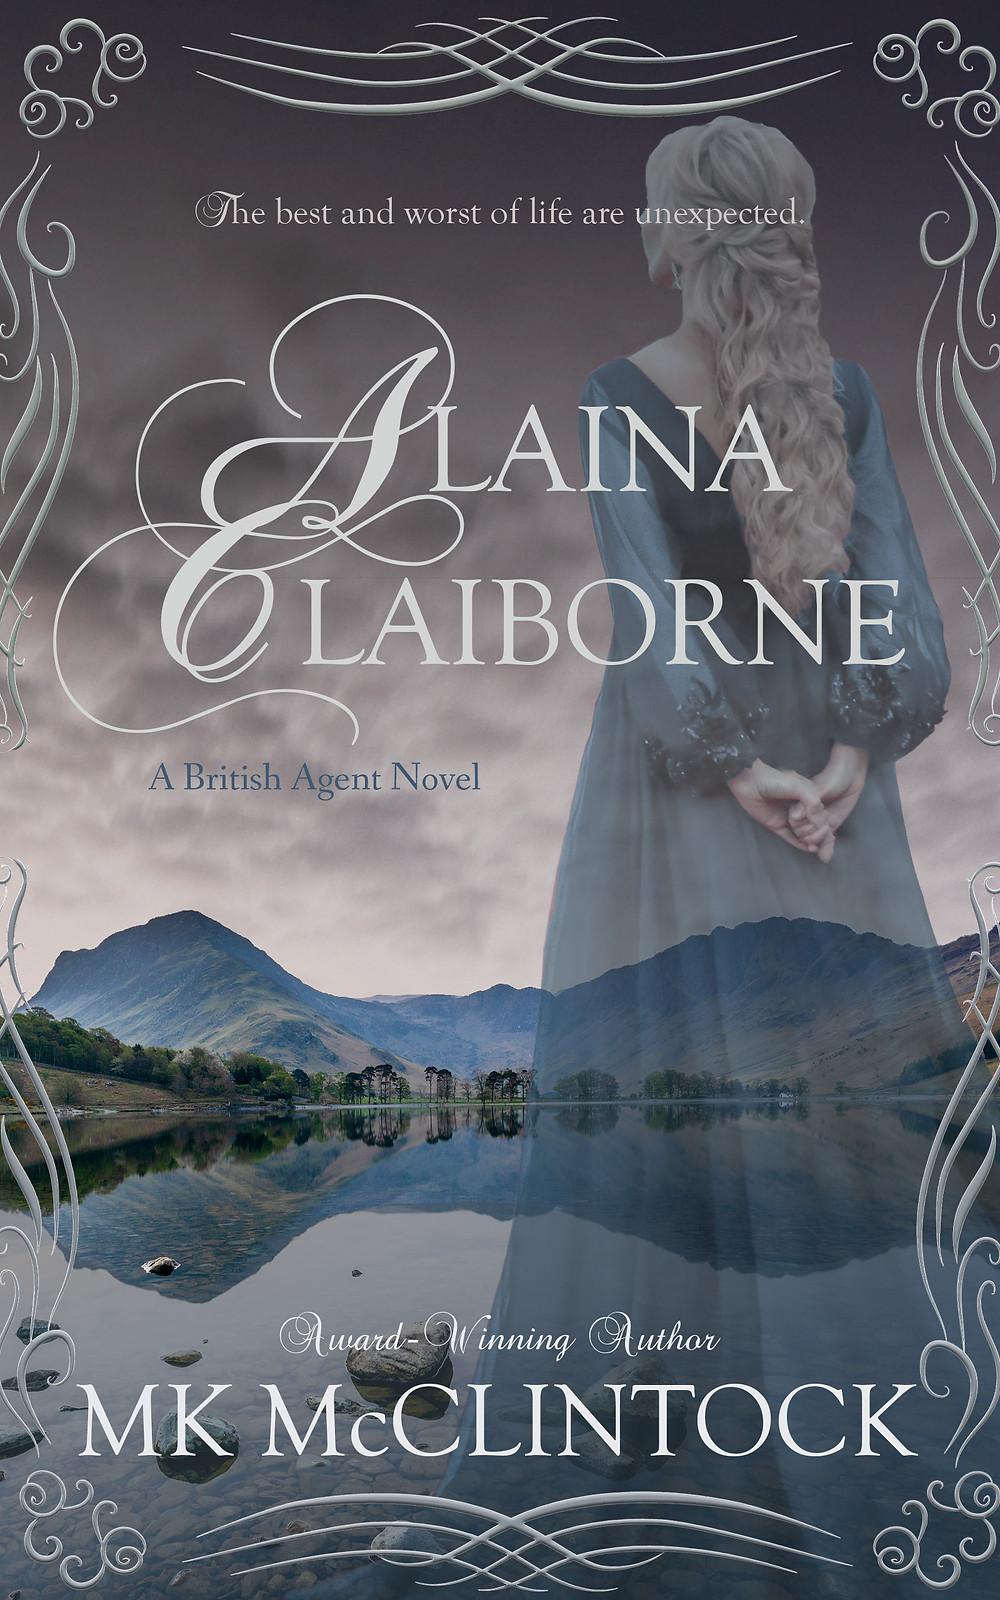 Blackwood Crossing by MK McClintock - historical romance mystery